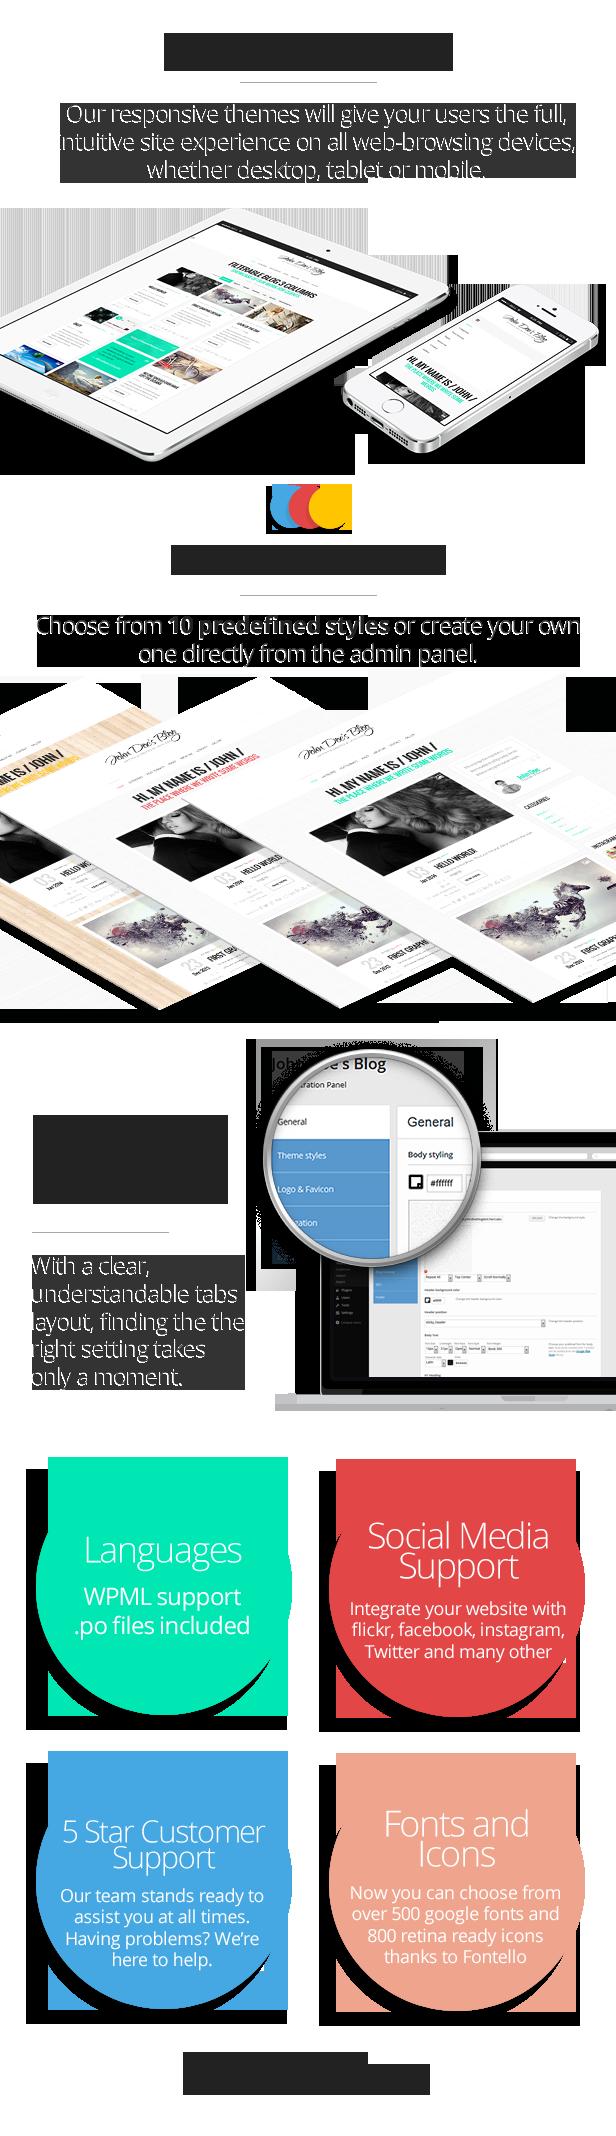 John Doe's Blog - Clean WordPress Blog Theme - 6